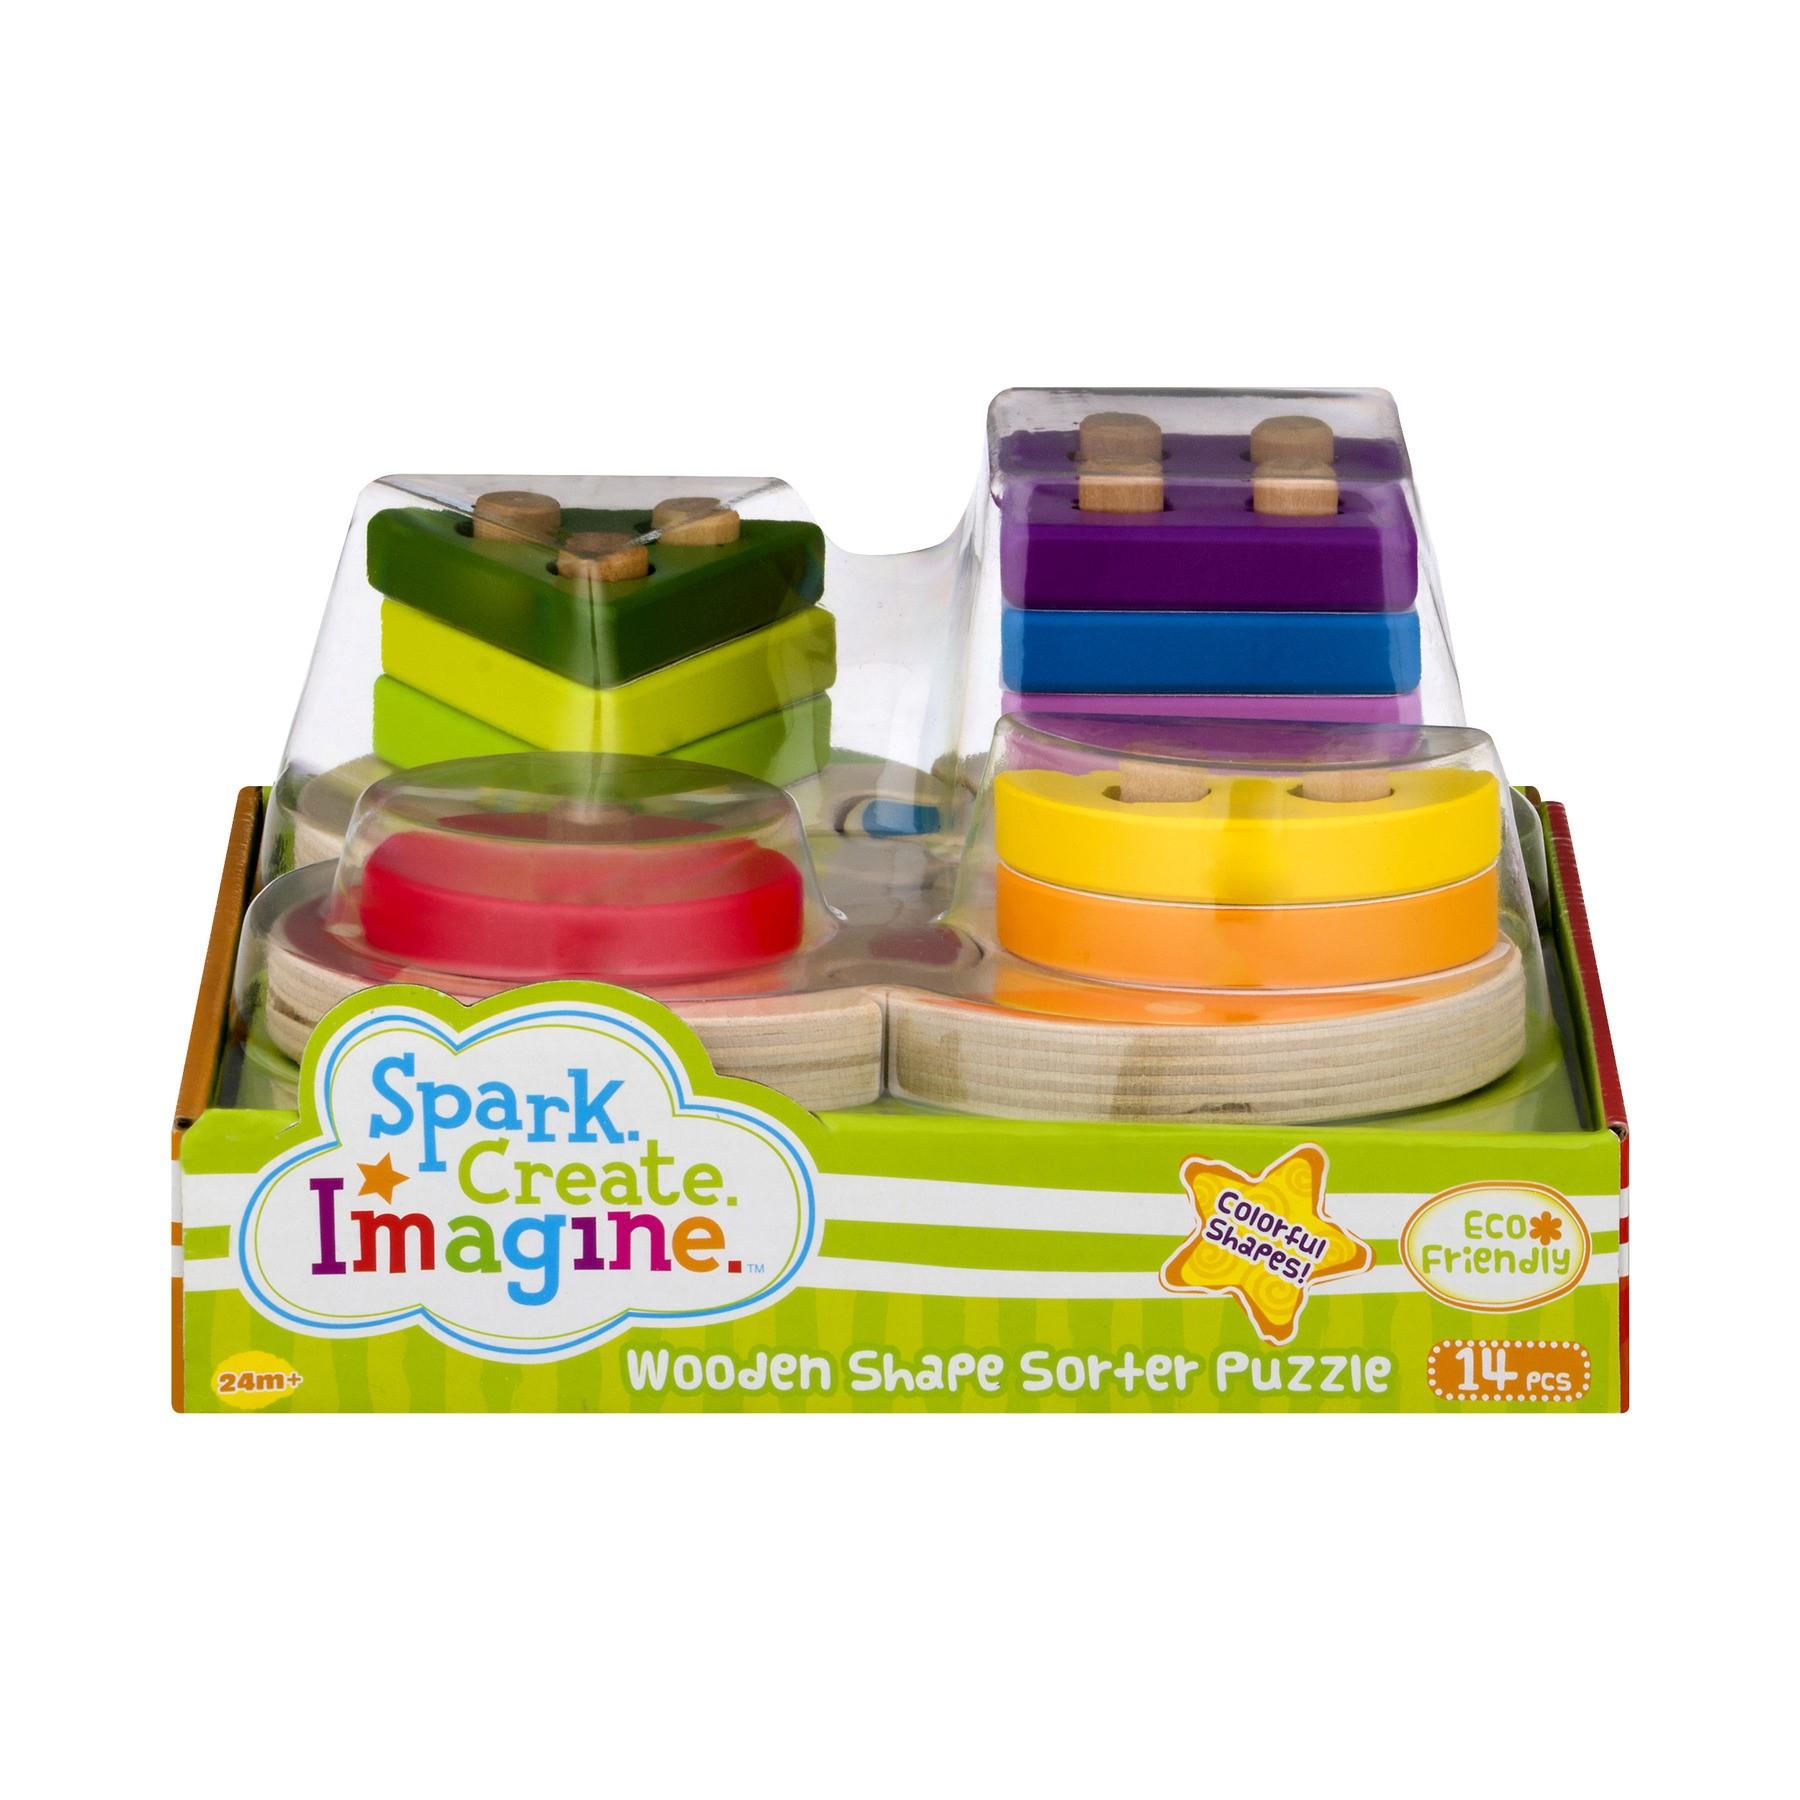 Spark Create Imagine Wooden Shape Sorter Puzzle, 14.0 PIECE(S)